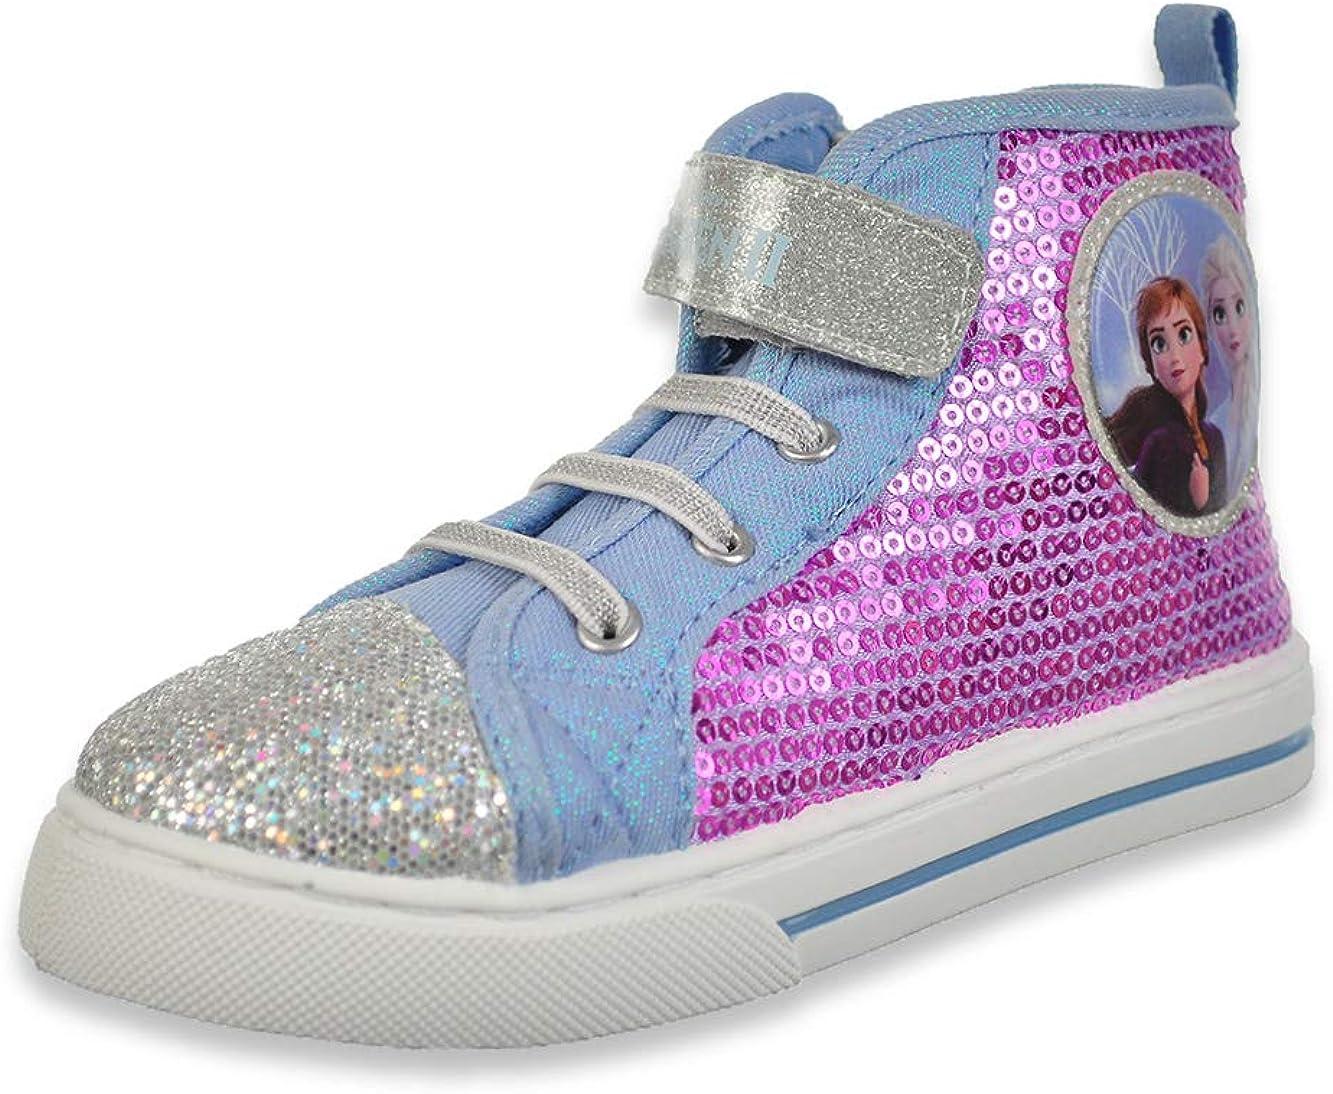 Josmo Topics on TV Kids Unisex-Child Max 53% OFF Sneaker Casual